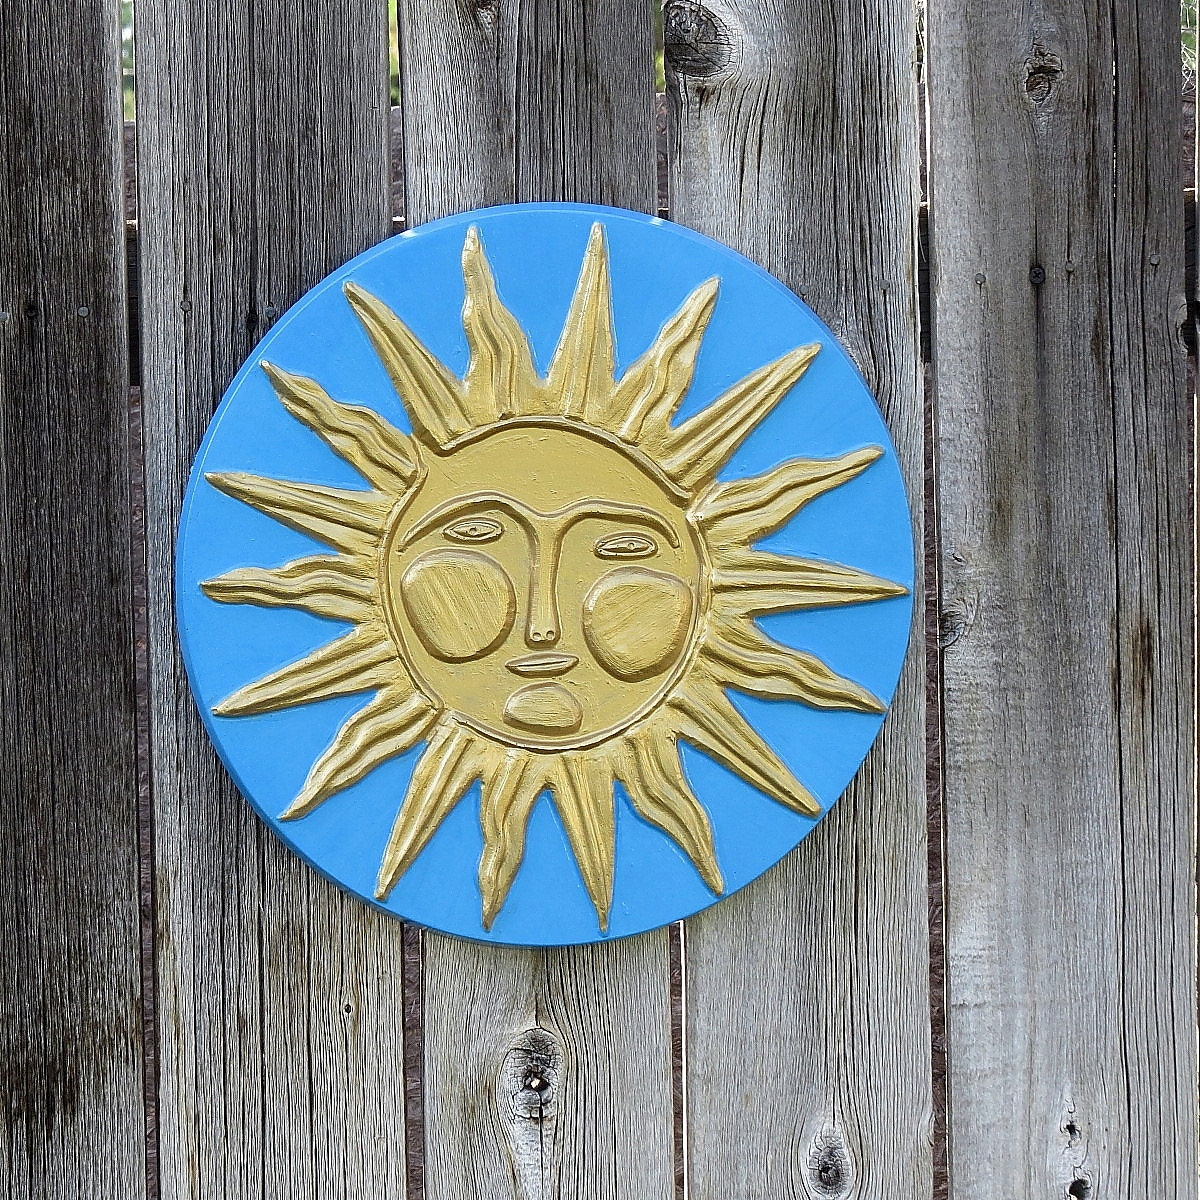 Perfect Large Metal Sun Face Sunburst Plaque Wall Decor Image - Wall ...